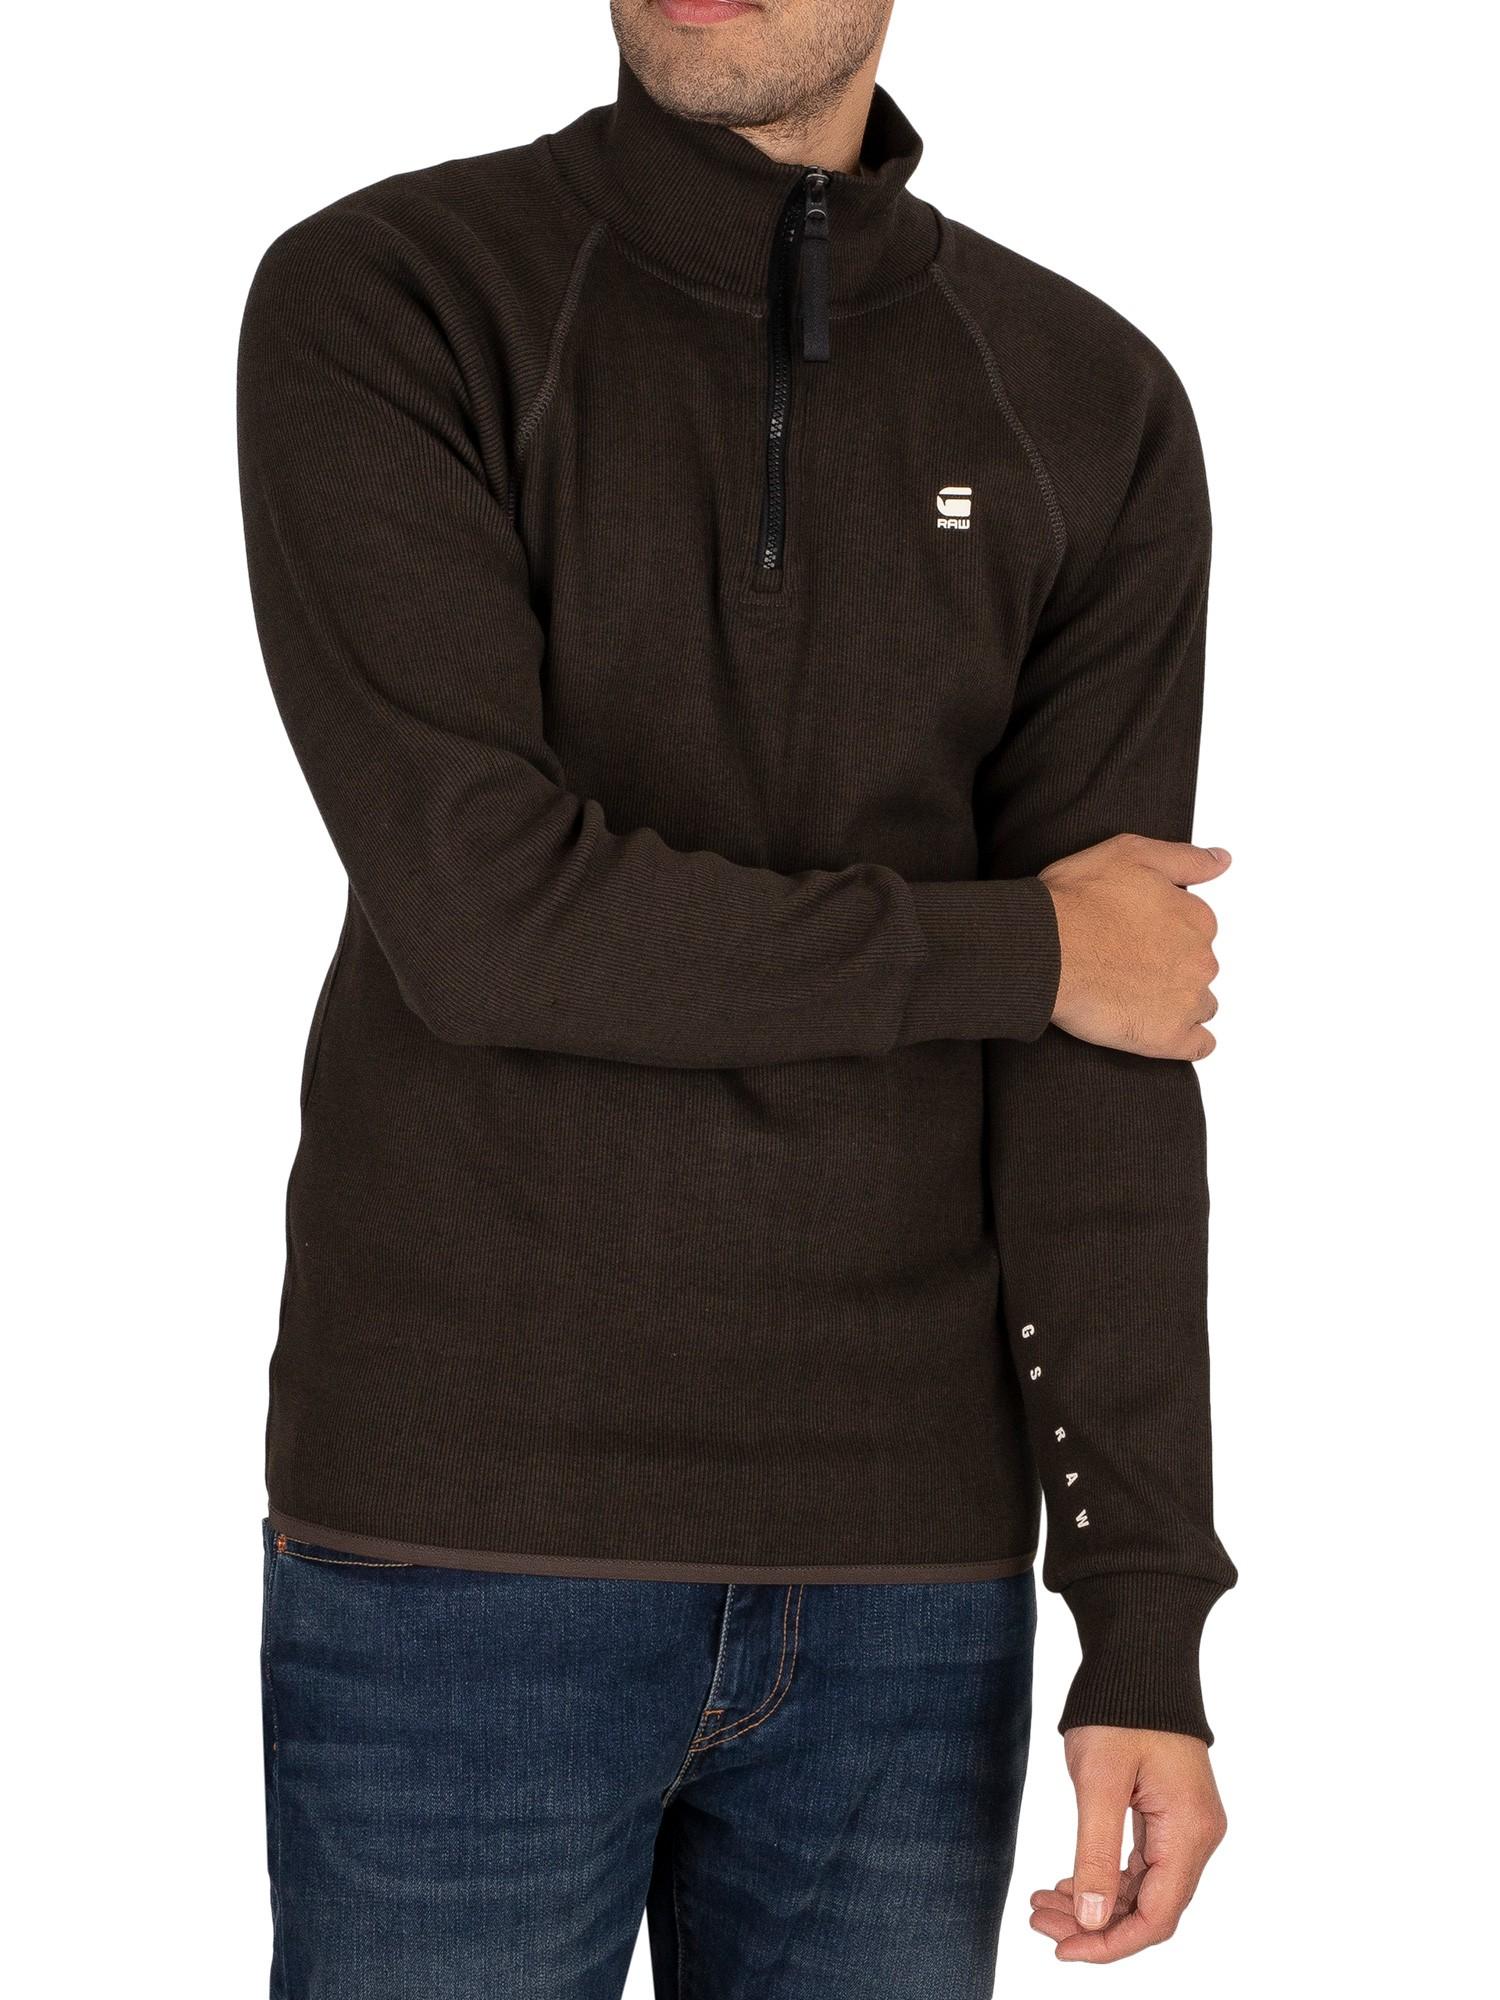 Plated Rib Half Zip Jirgi Sweatshirt